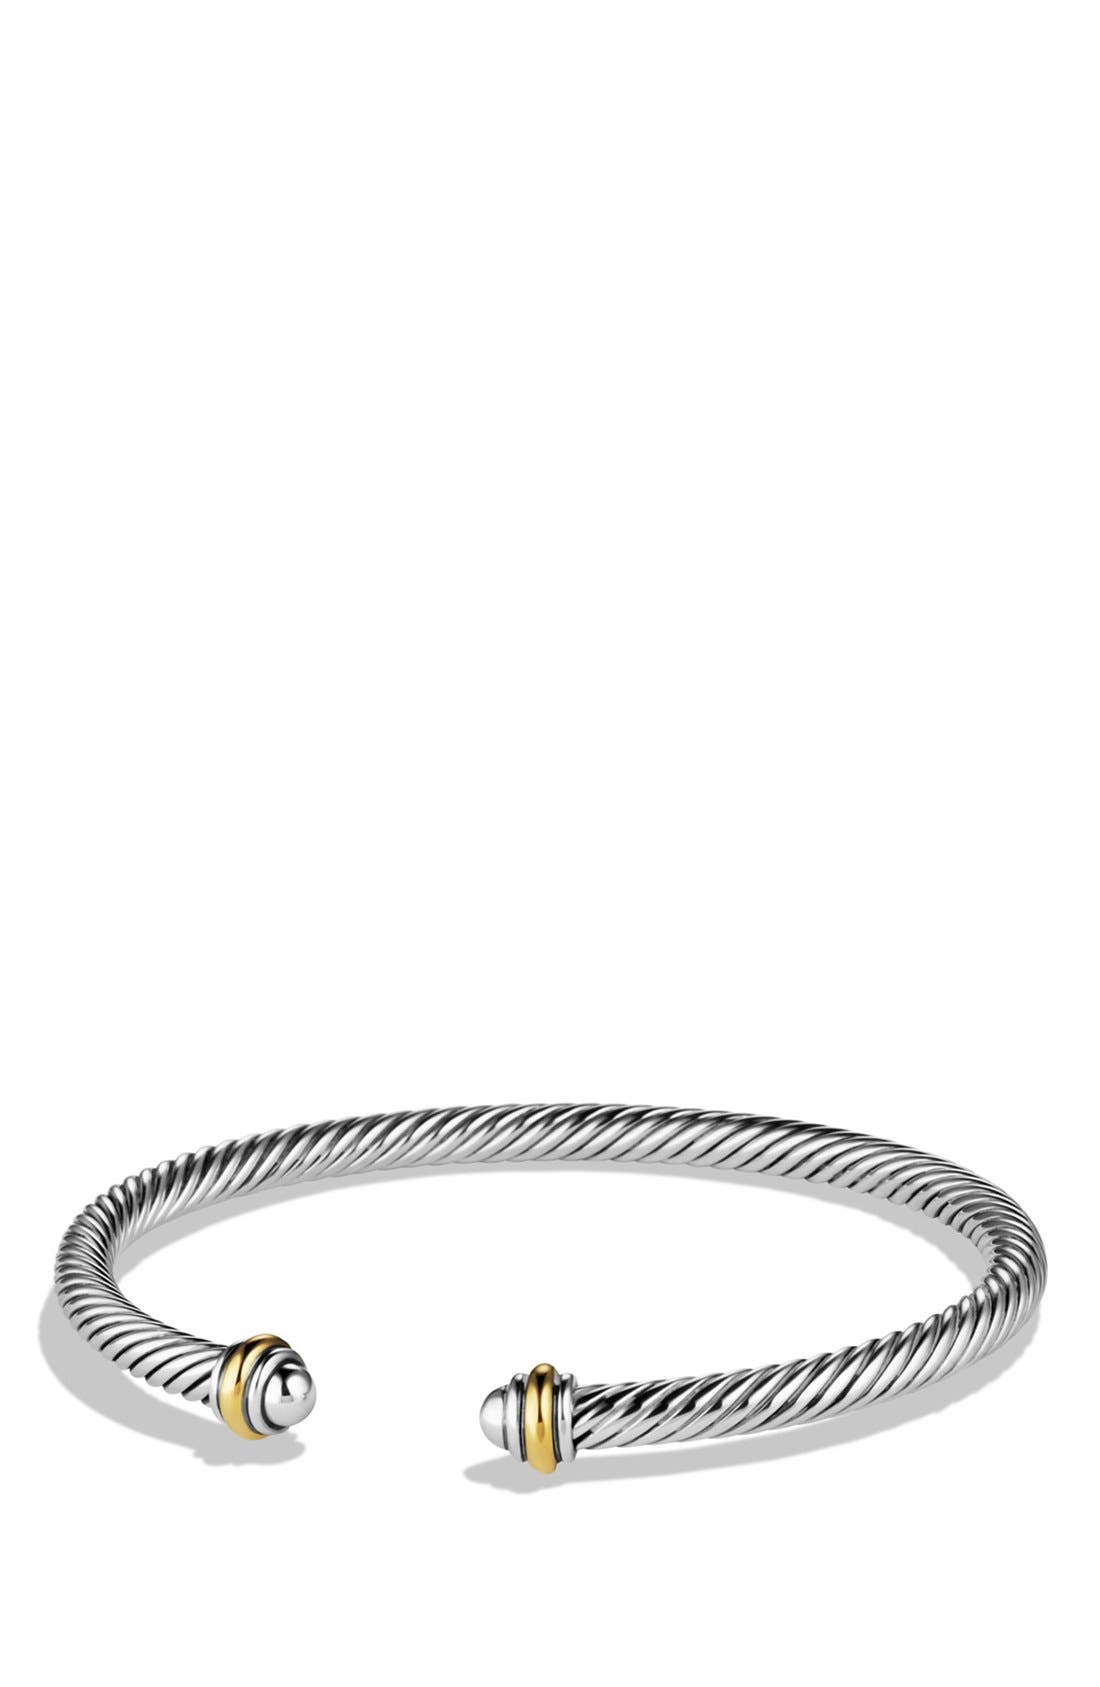 DAVID YURMAN, Cable Classics Bracelet with 18K Gold, 4mm, Main thumbnail 1, color, TWO TONE